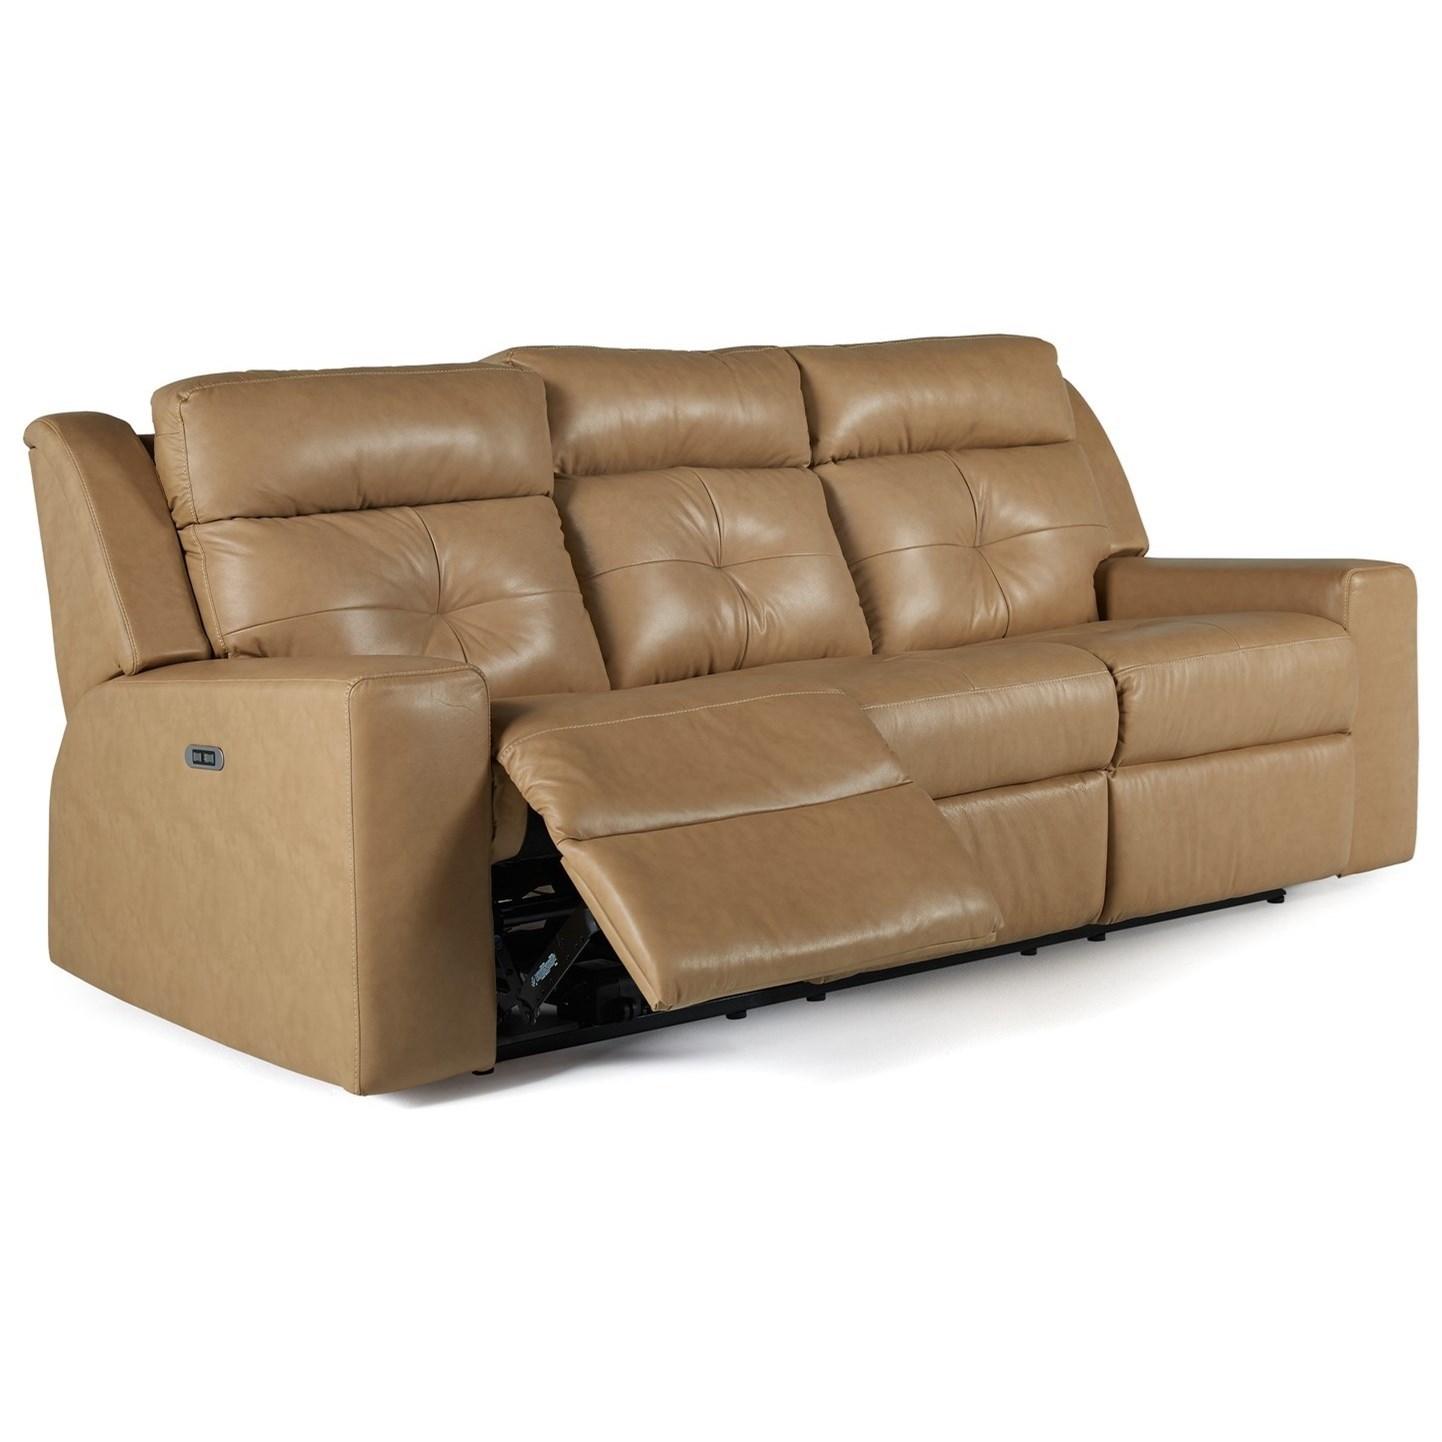 Grove Sofa PwrRecliner w/ Power Headrest by Palliser at Jacksonville Furniture Mart